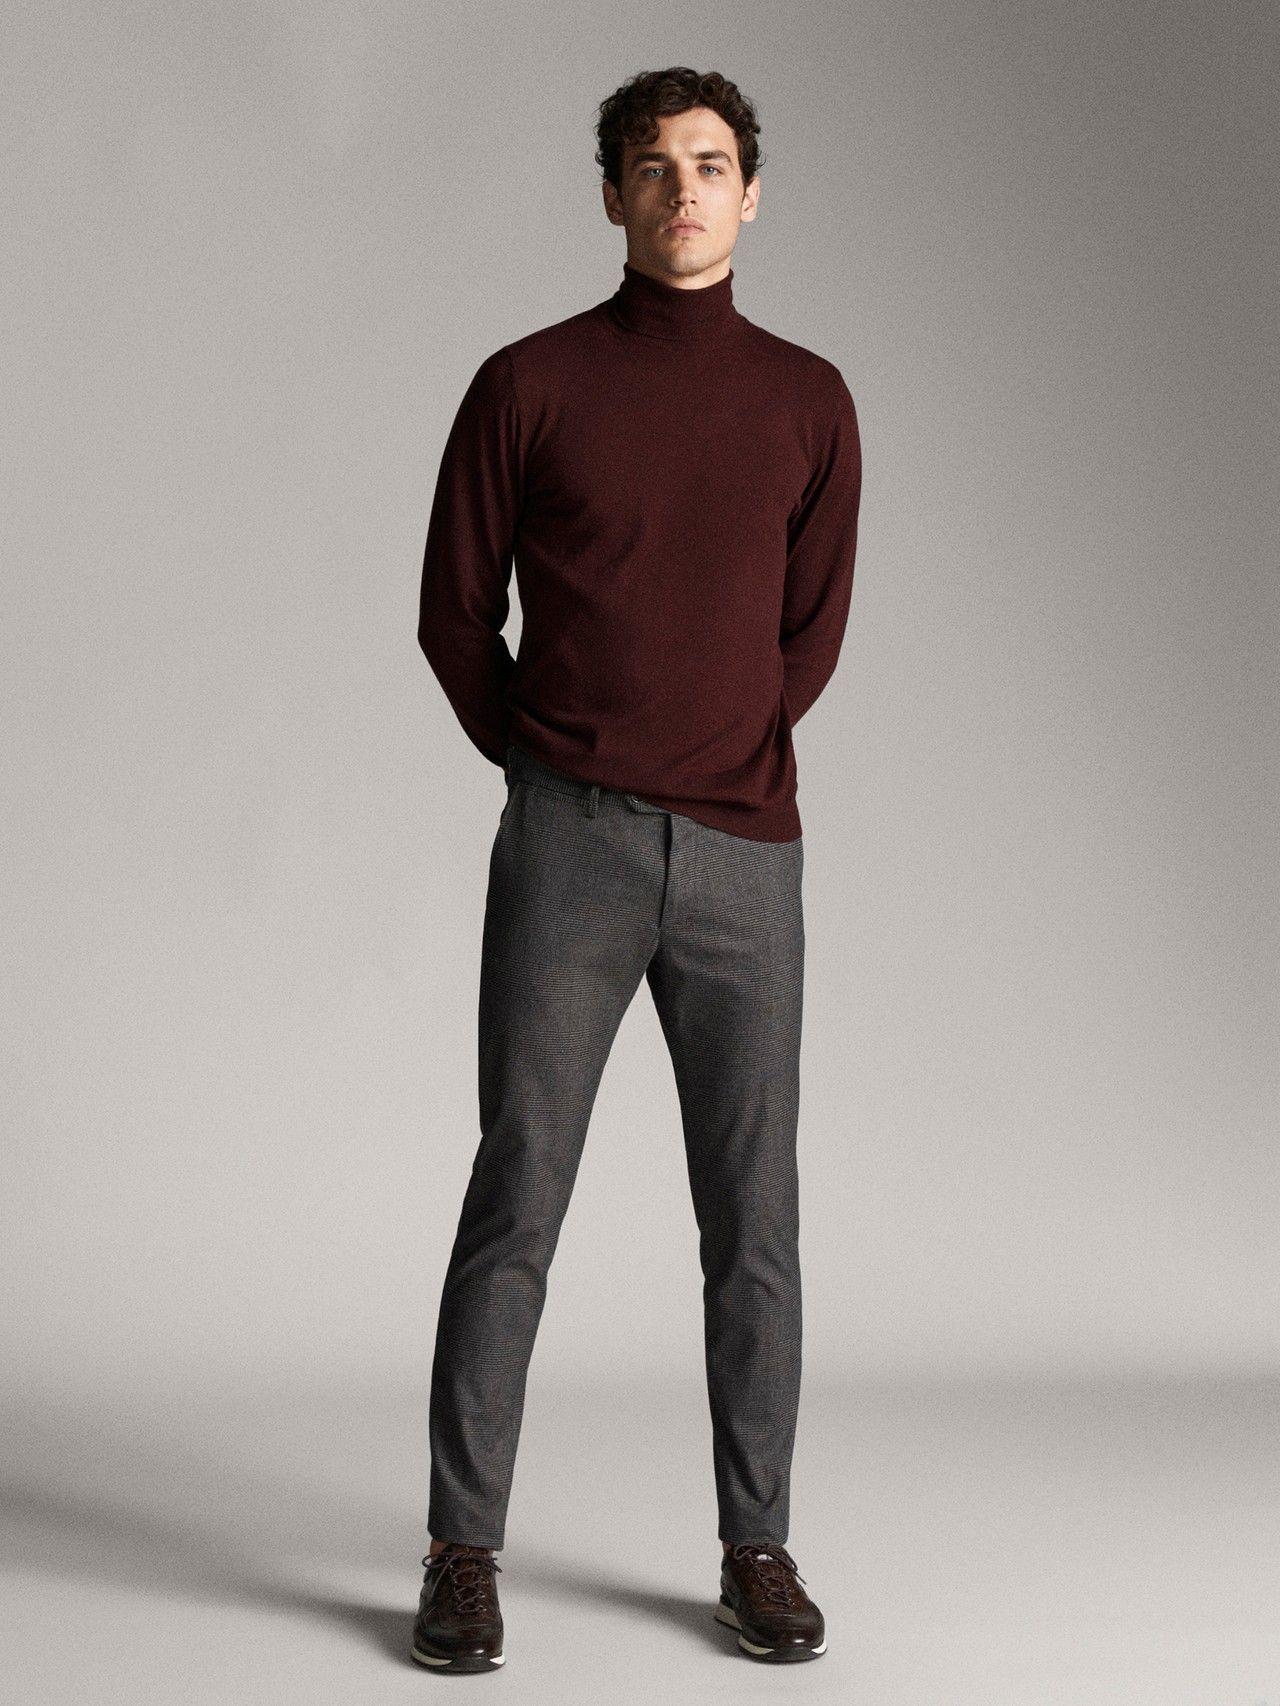 Massimo Dutti Hombre Pantalon Chino Cuadros Slim Fit Gris 44 Combinar Ropa Hombre Pantalones De Hombre Moda Ropa Casual De Hombre